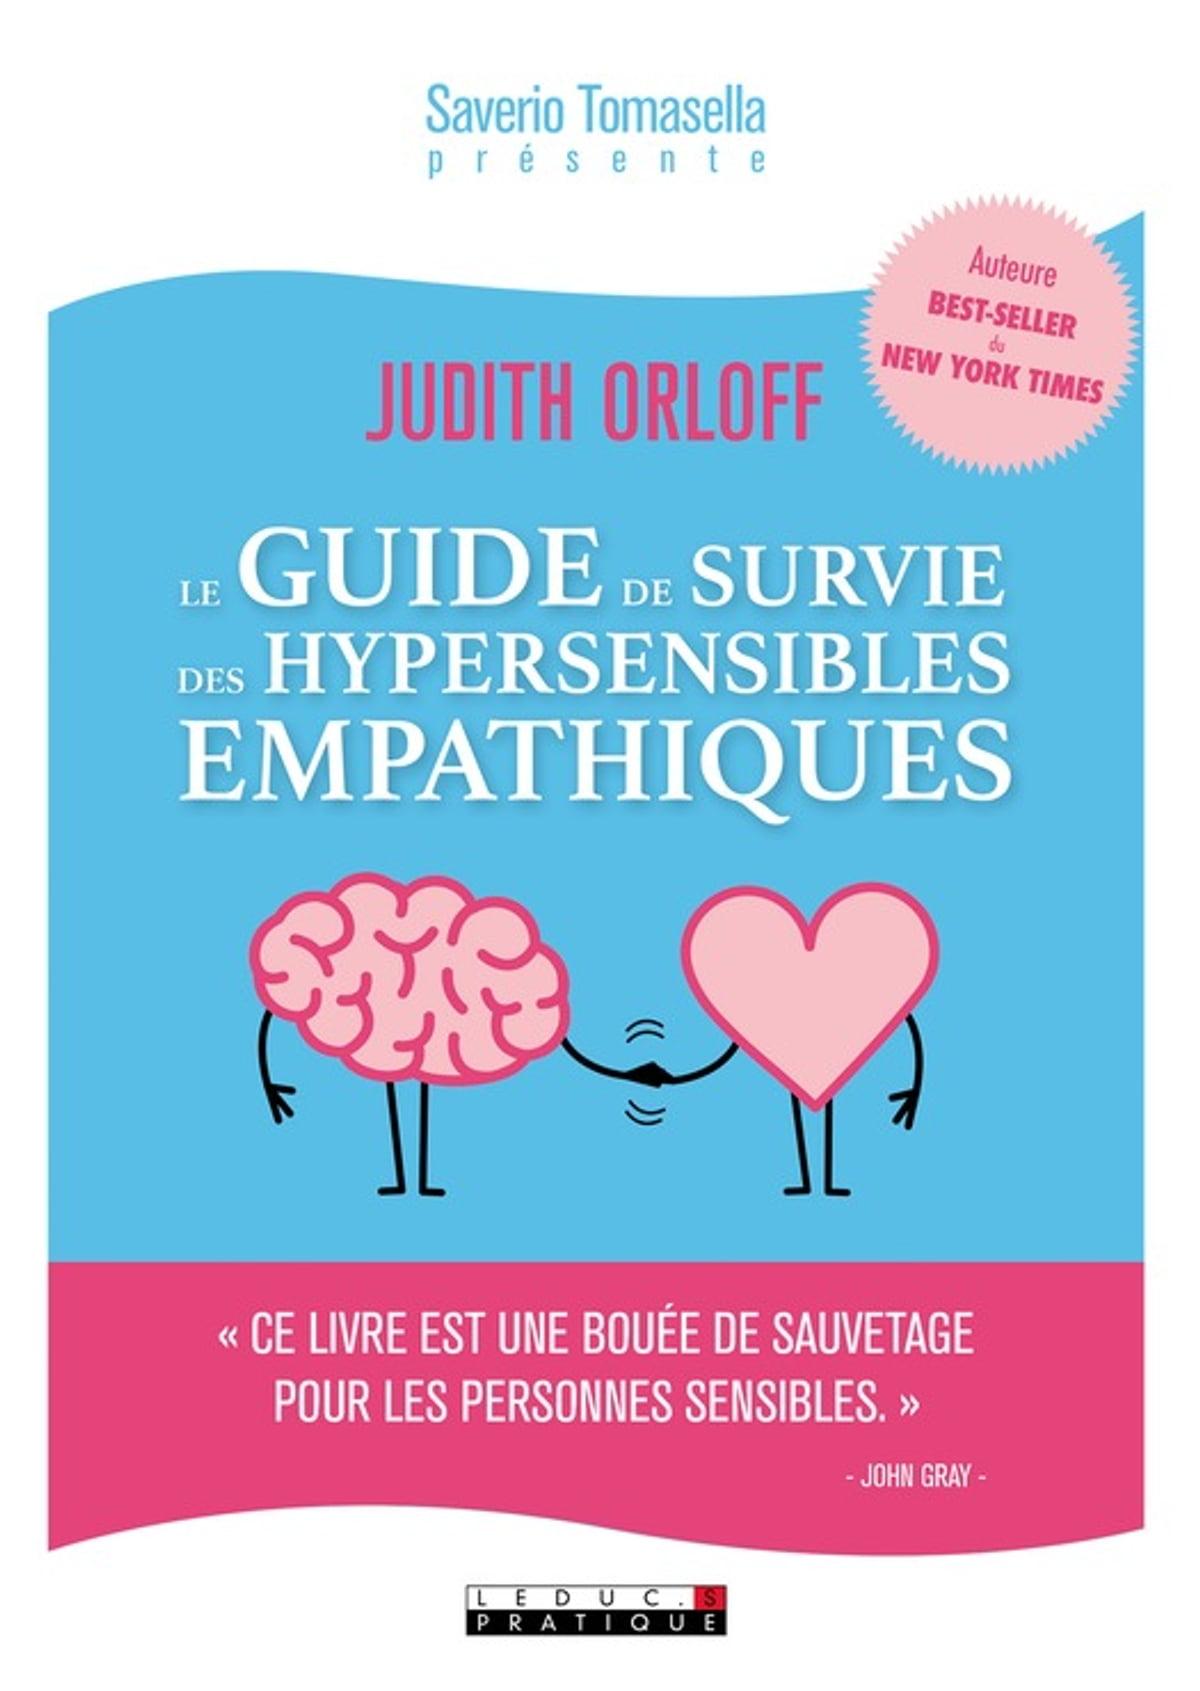 Le Guide De Survie Des Hypersensibles Empathiques : guide, survie, hypersensibles, empathiques, Guide, Survie, Hypersensibles, Empathiques, EBook, Judith, Orloff, 9791028511593, Rakuten, Canada